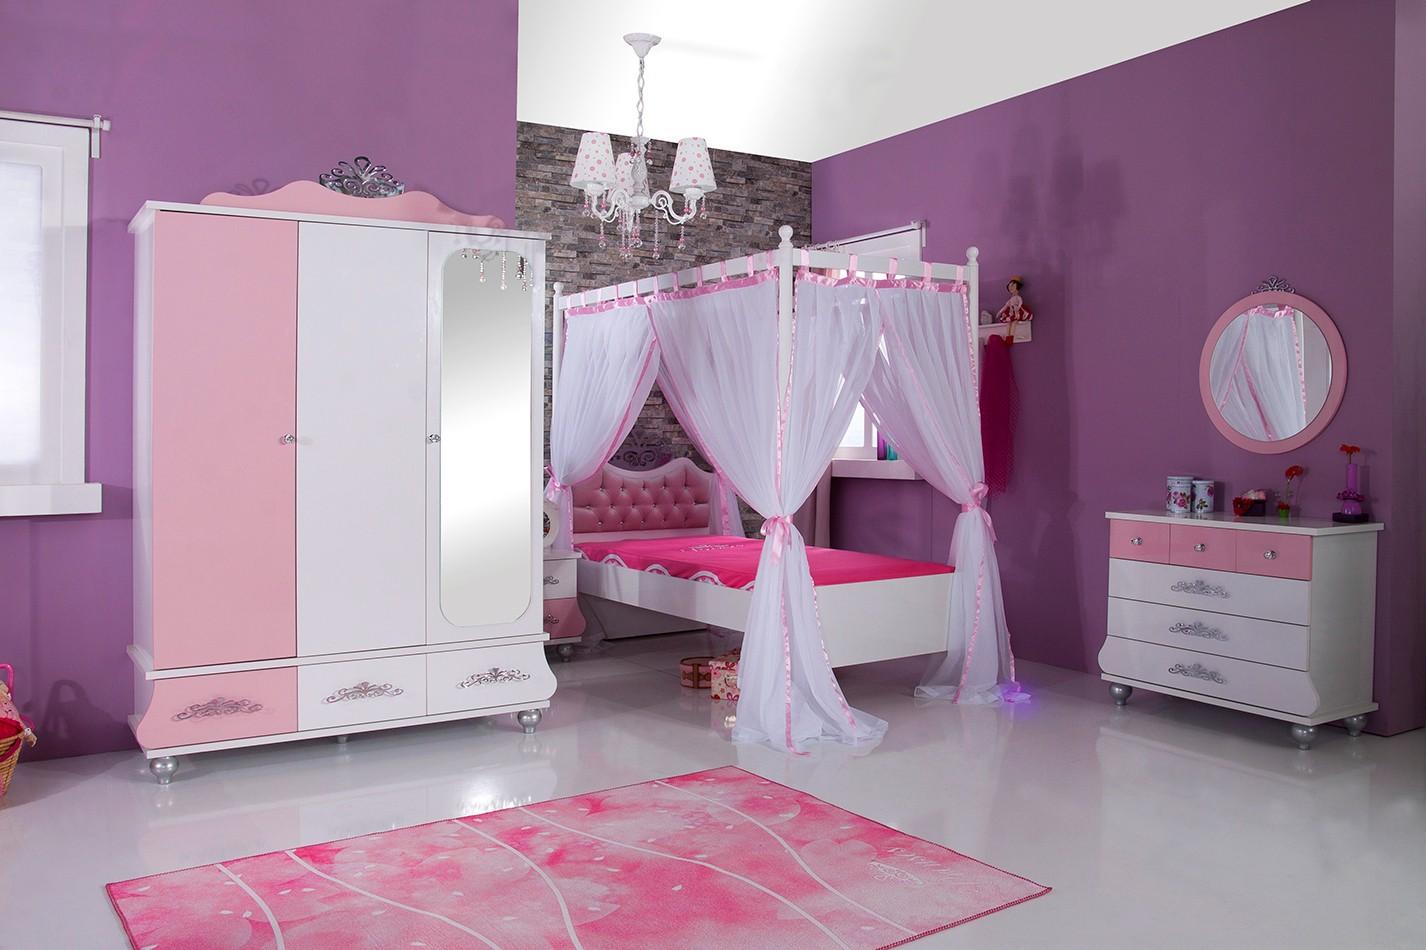 Prinsessenkamer roze 3 delige aanbiedingsset kinderkamer kinderbed terrashaard en barbecues - Kinderkamer grijs en roze ...